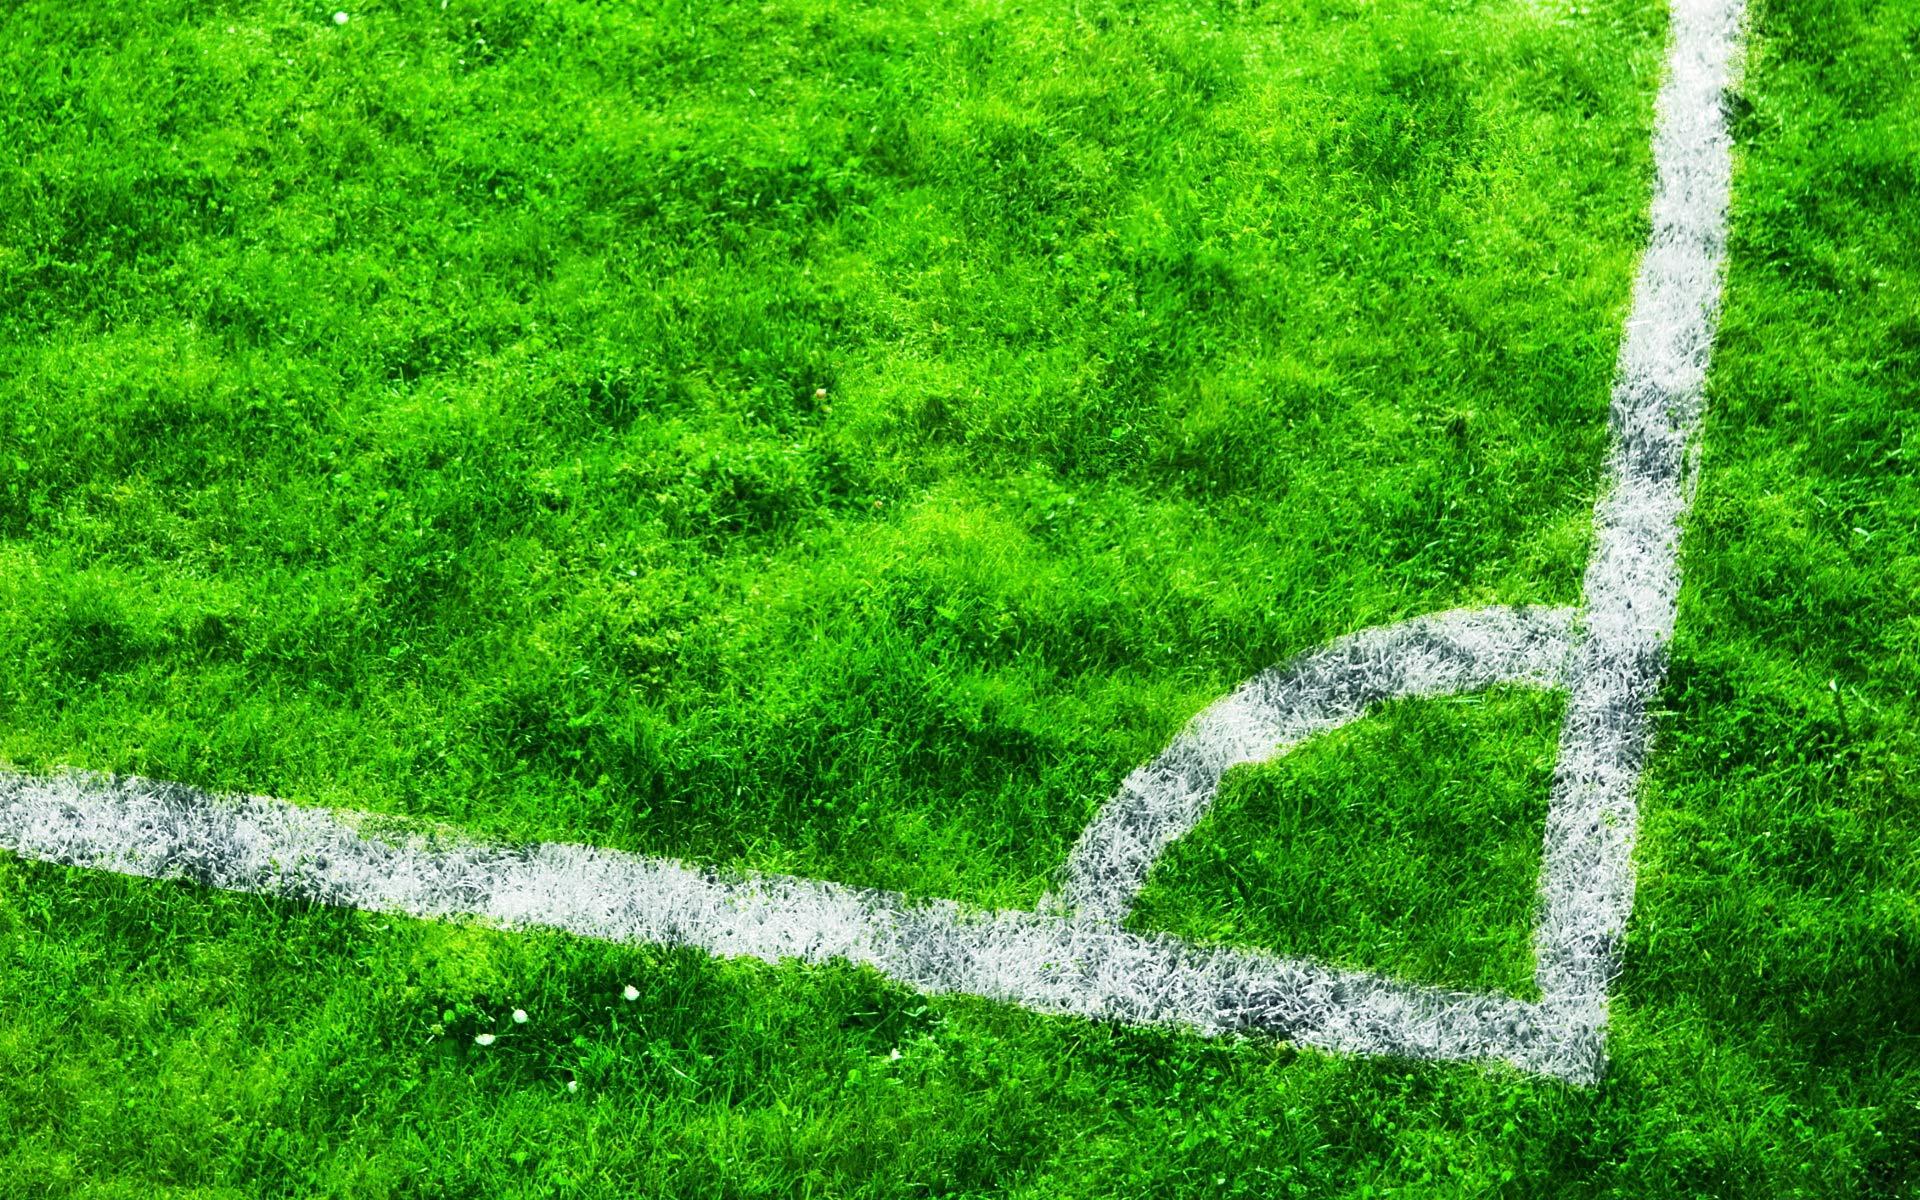 Football Wallpaper For Computer   Football Wallpaper HD Football 1920x1200